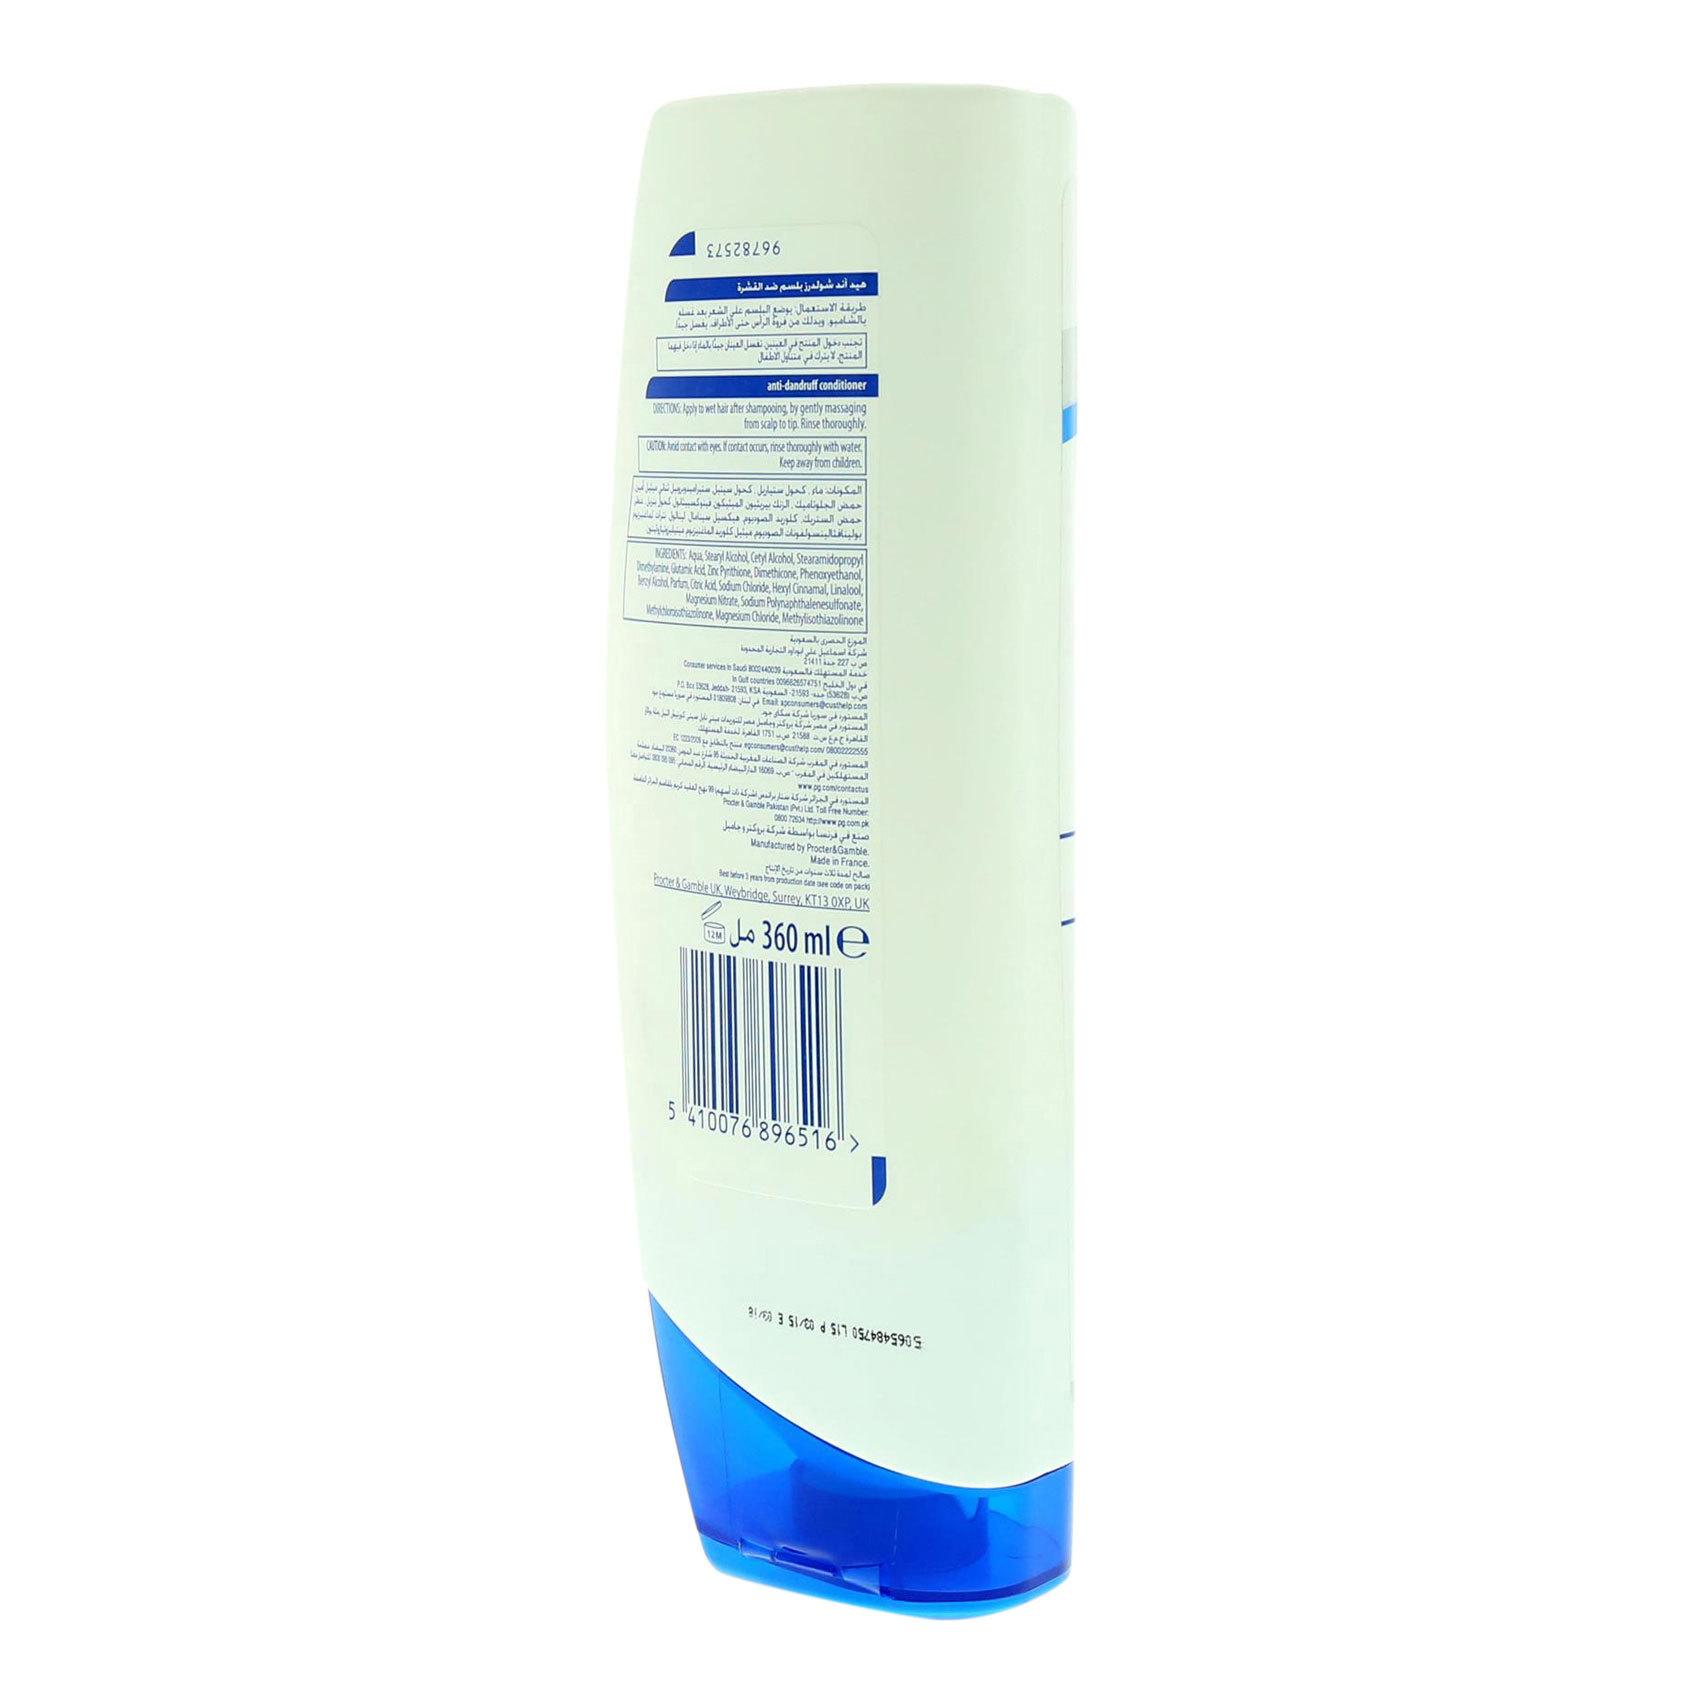 H&S COND. CLASSIC CLEAN 360ML